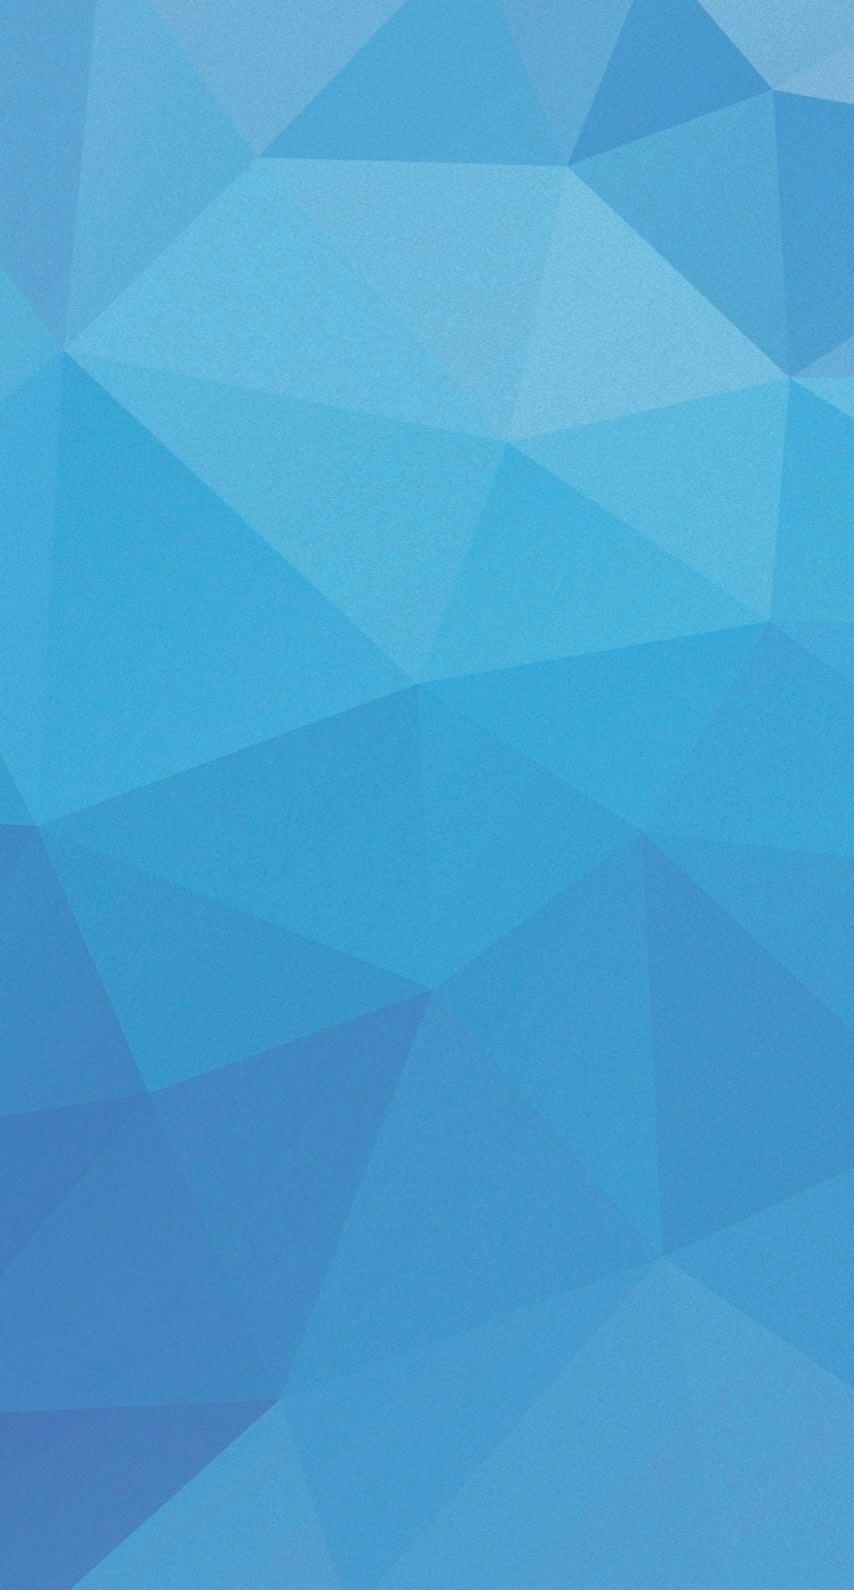 Pattern Blue Water Wallpaper Sc Iphone7